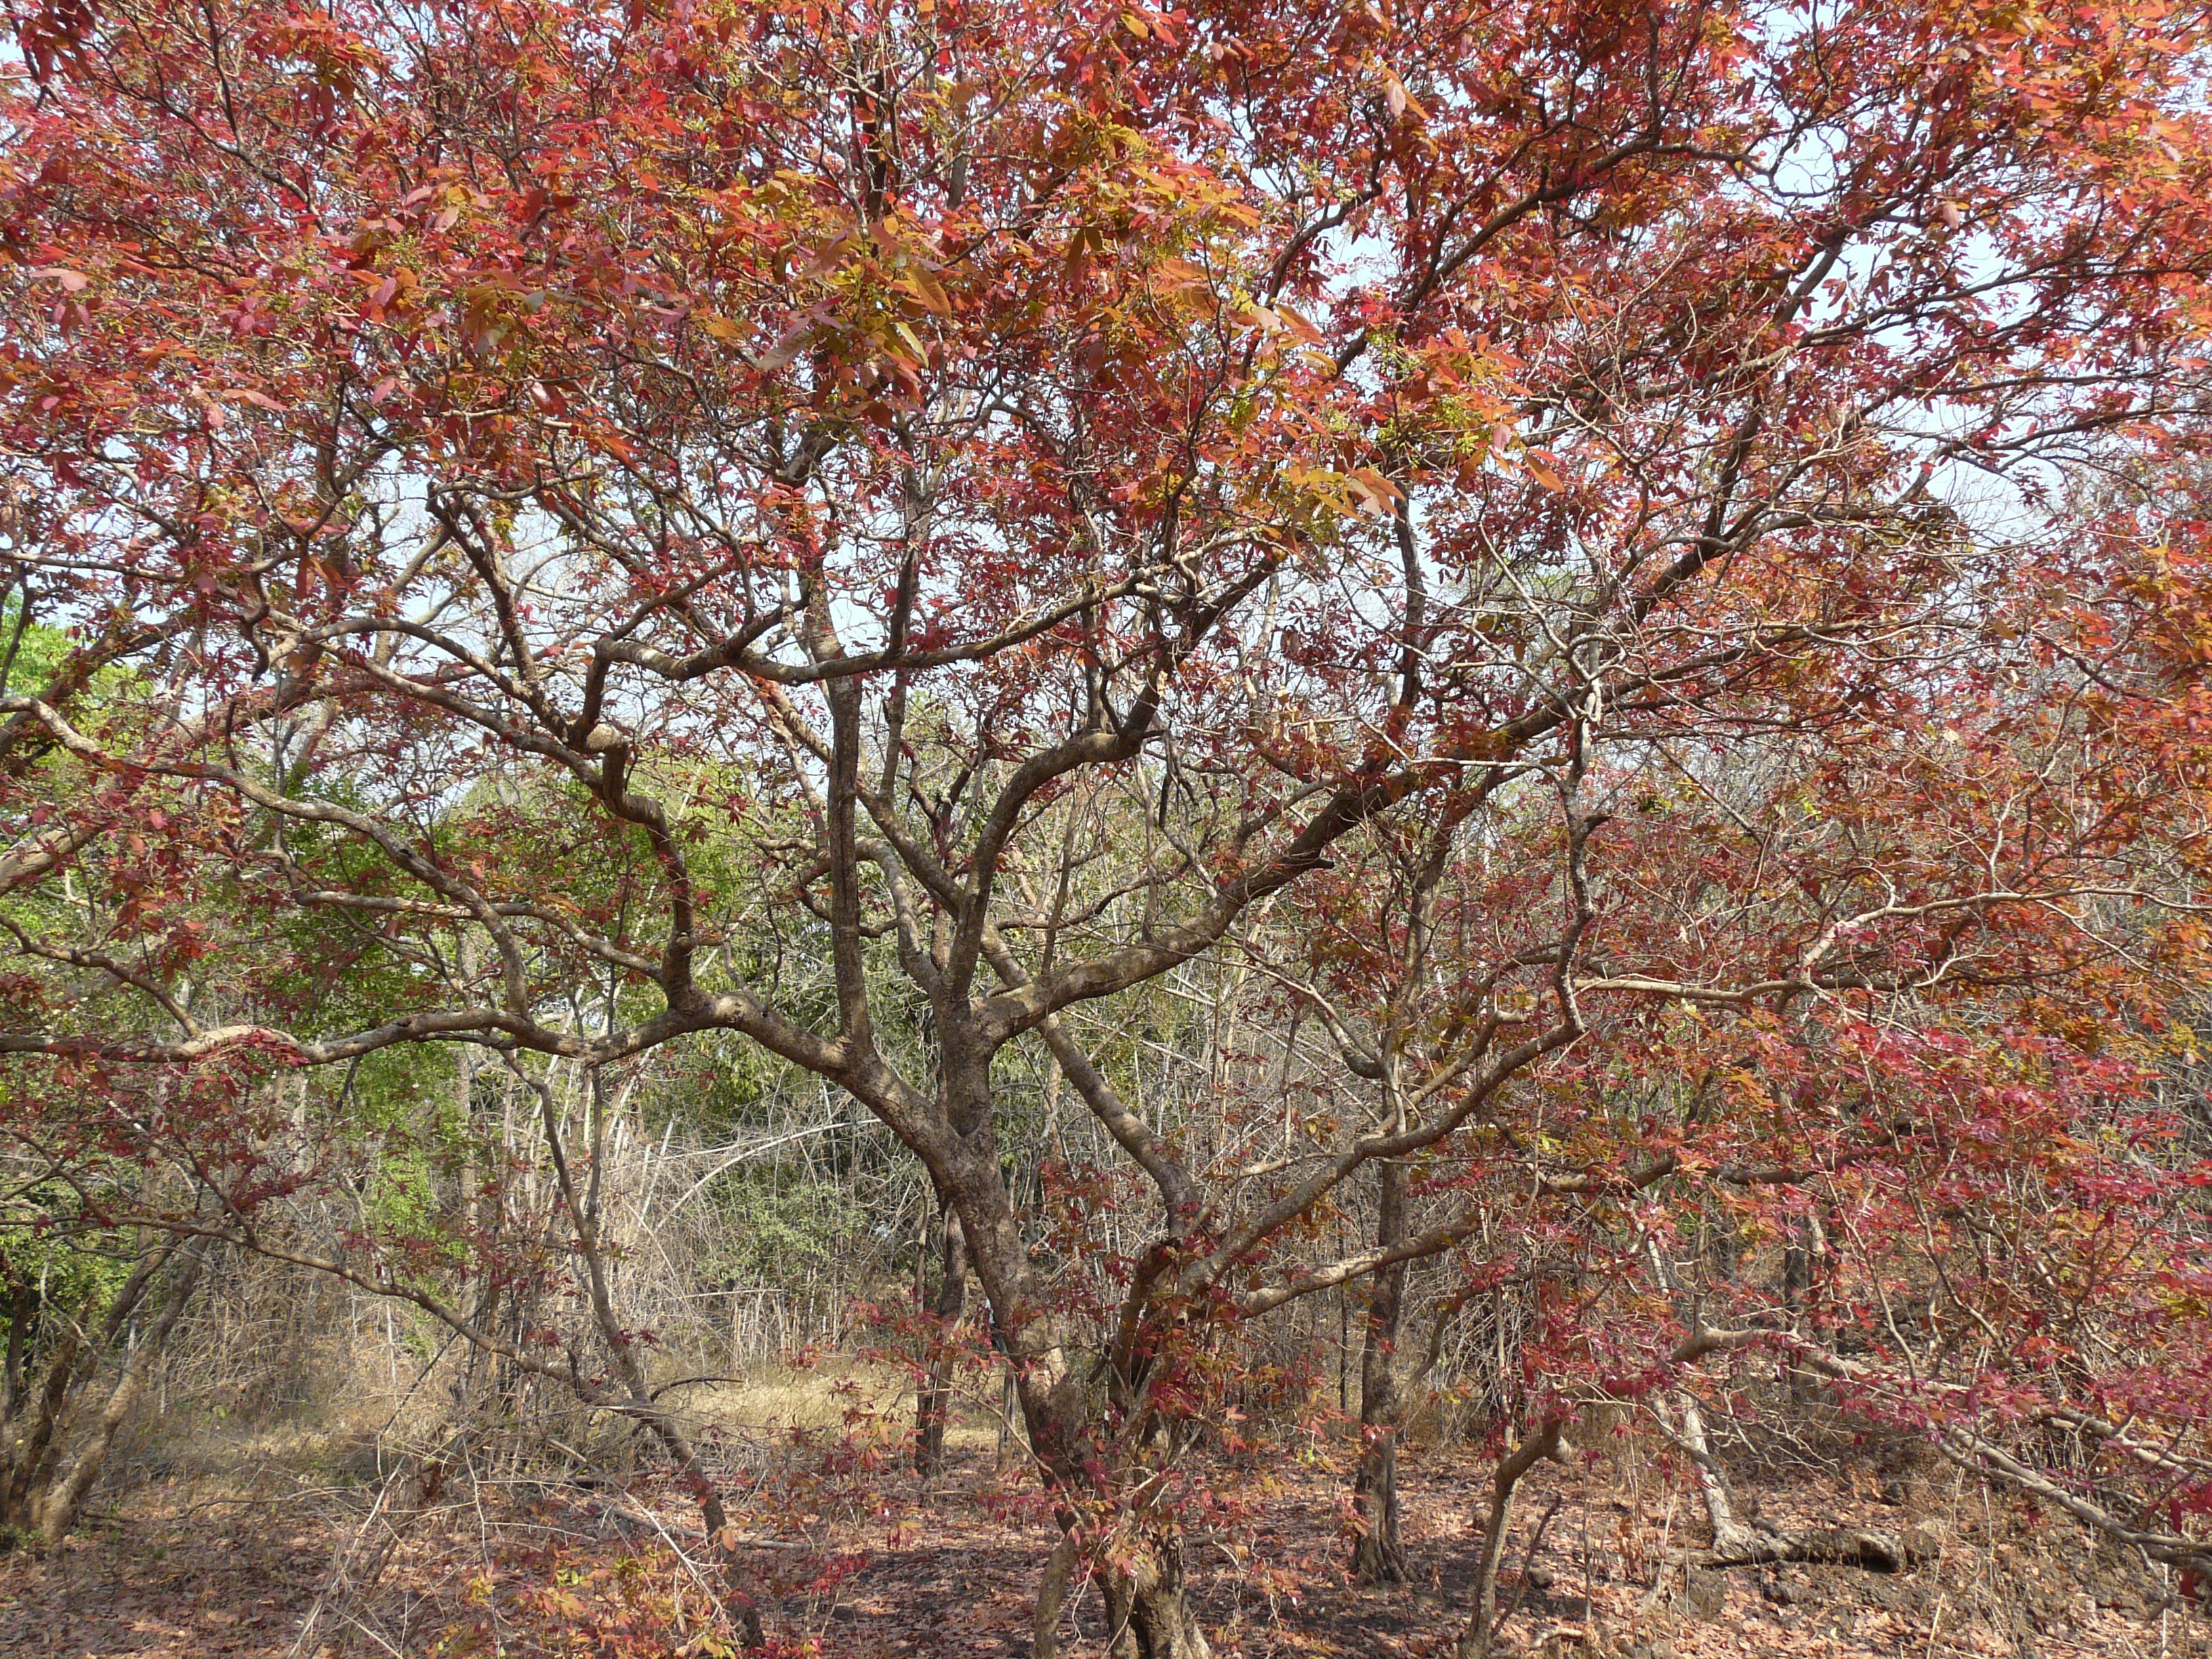 Kumpatiri (Tamil: கும்பாதிரி) | Flickr - Photo Sharing!